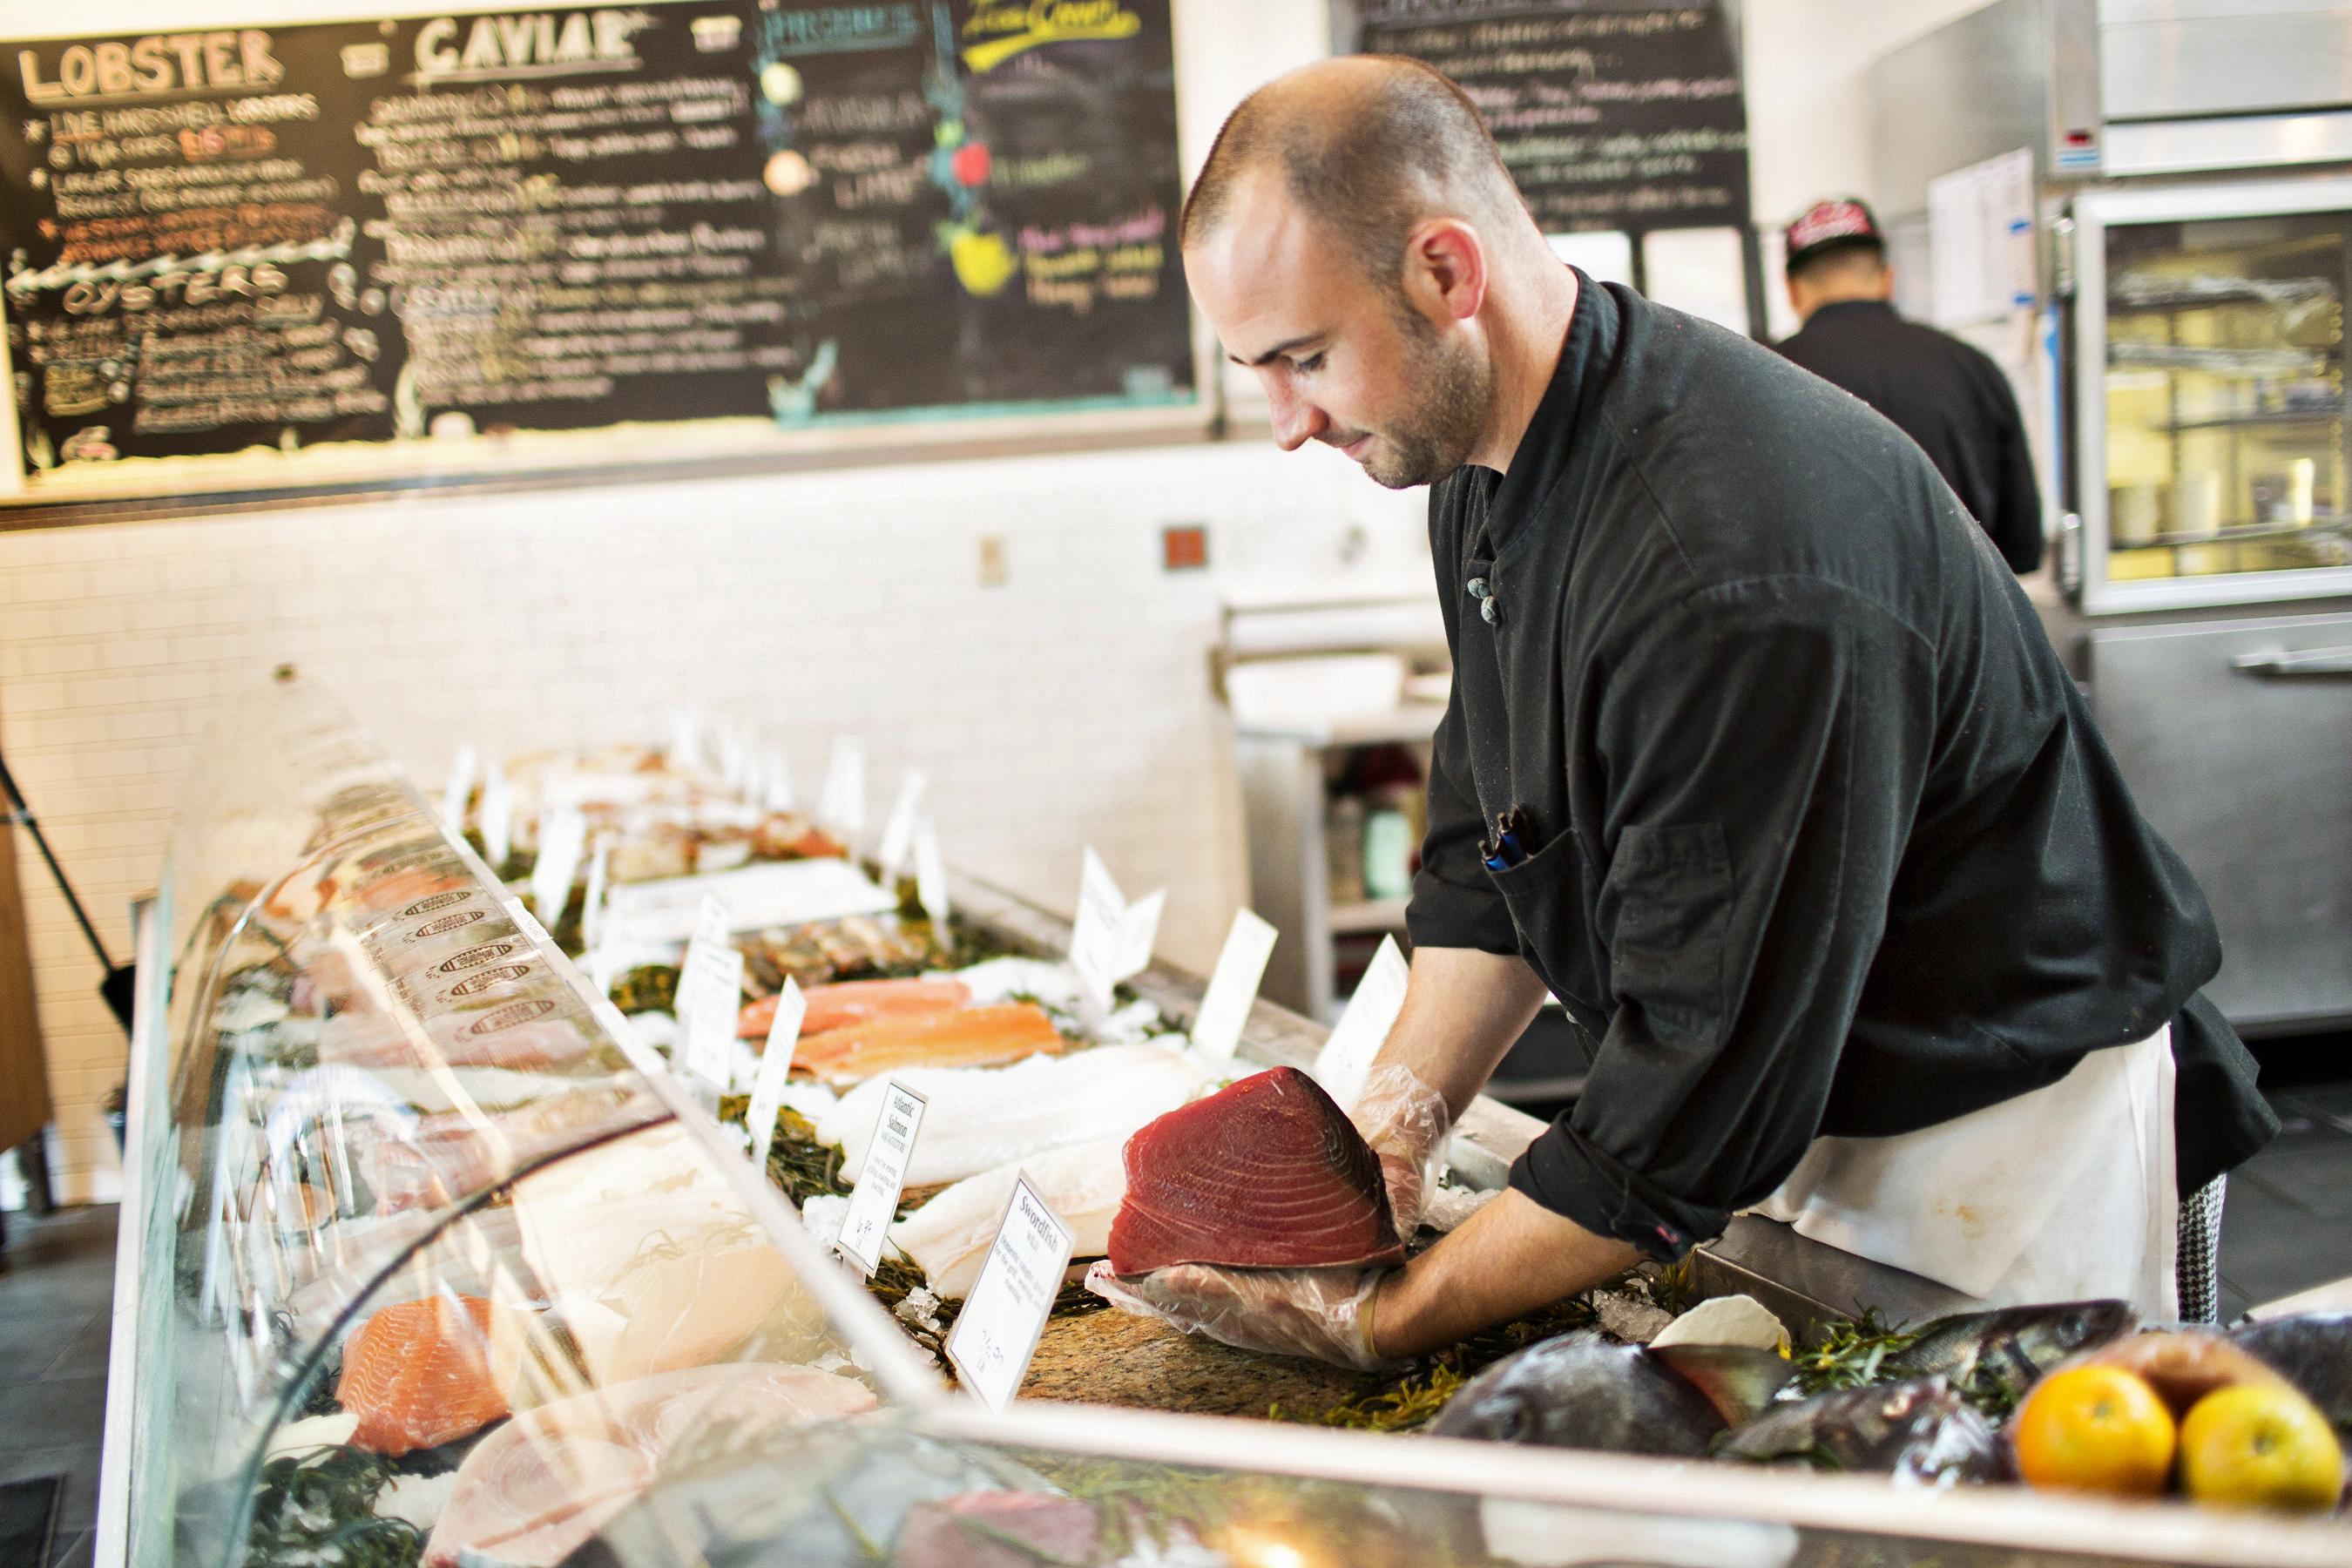 Blacksalt fishmonger M.J. Gimbar